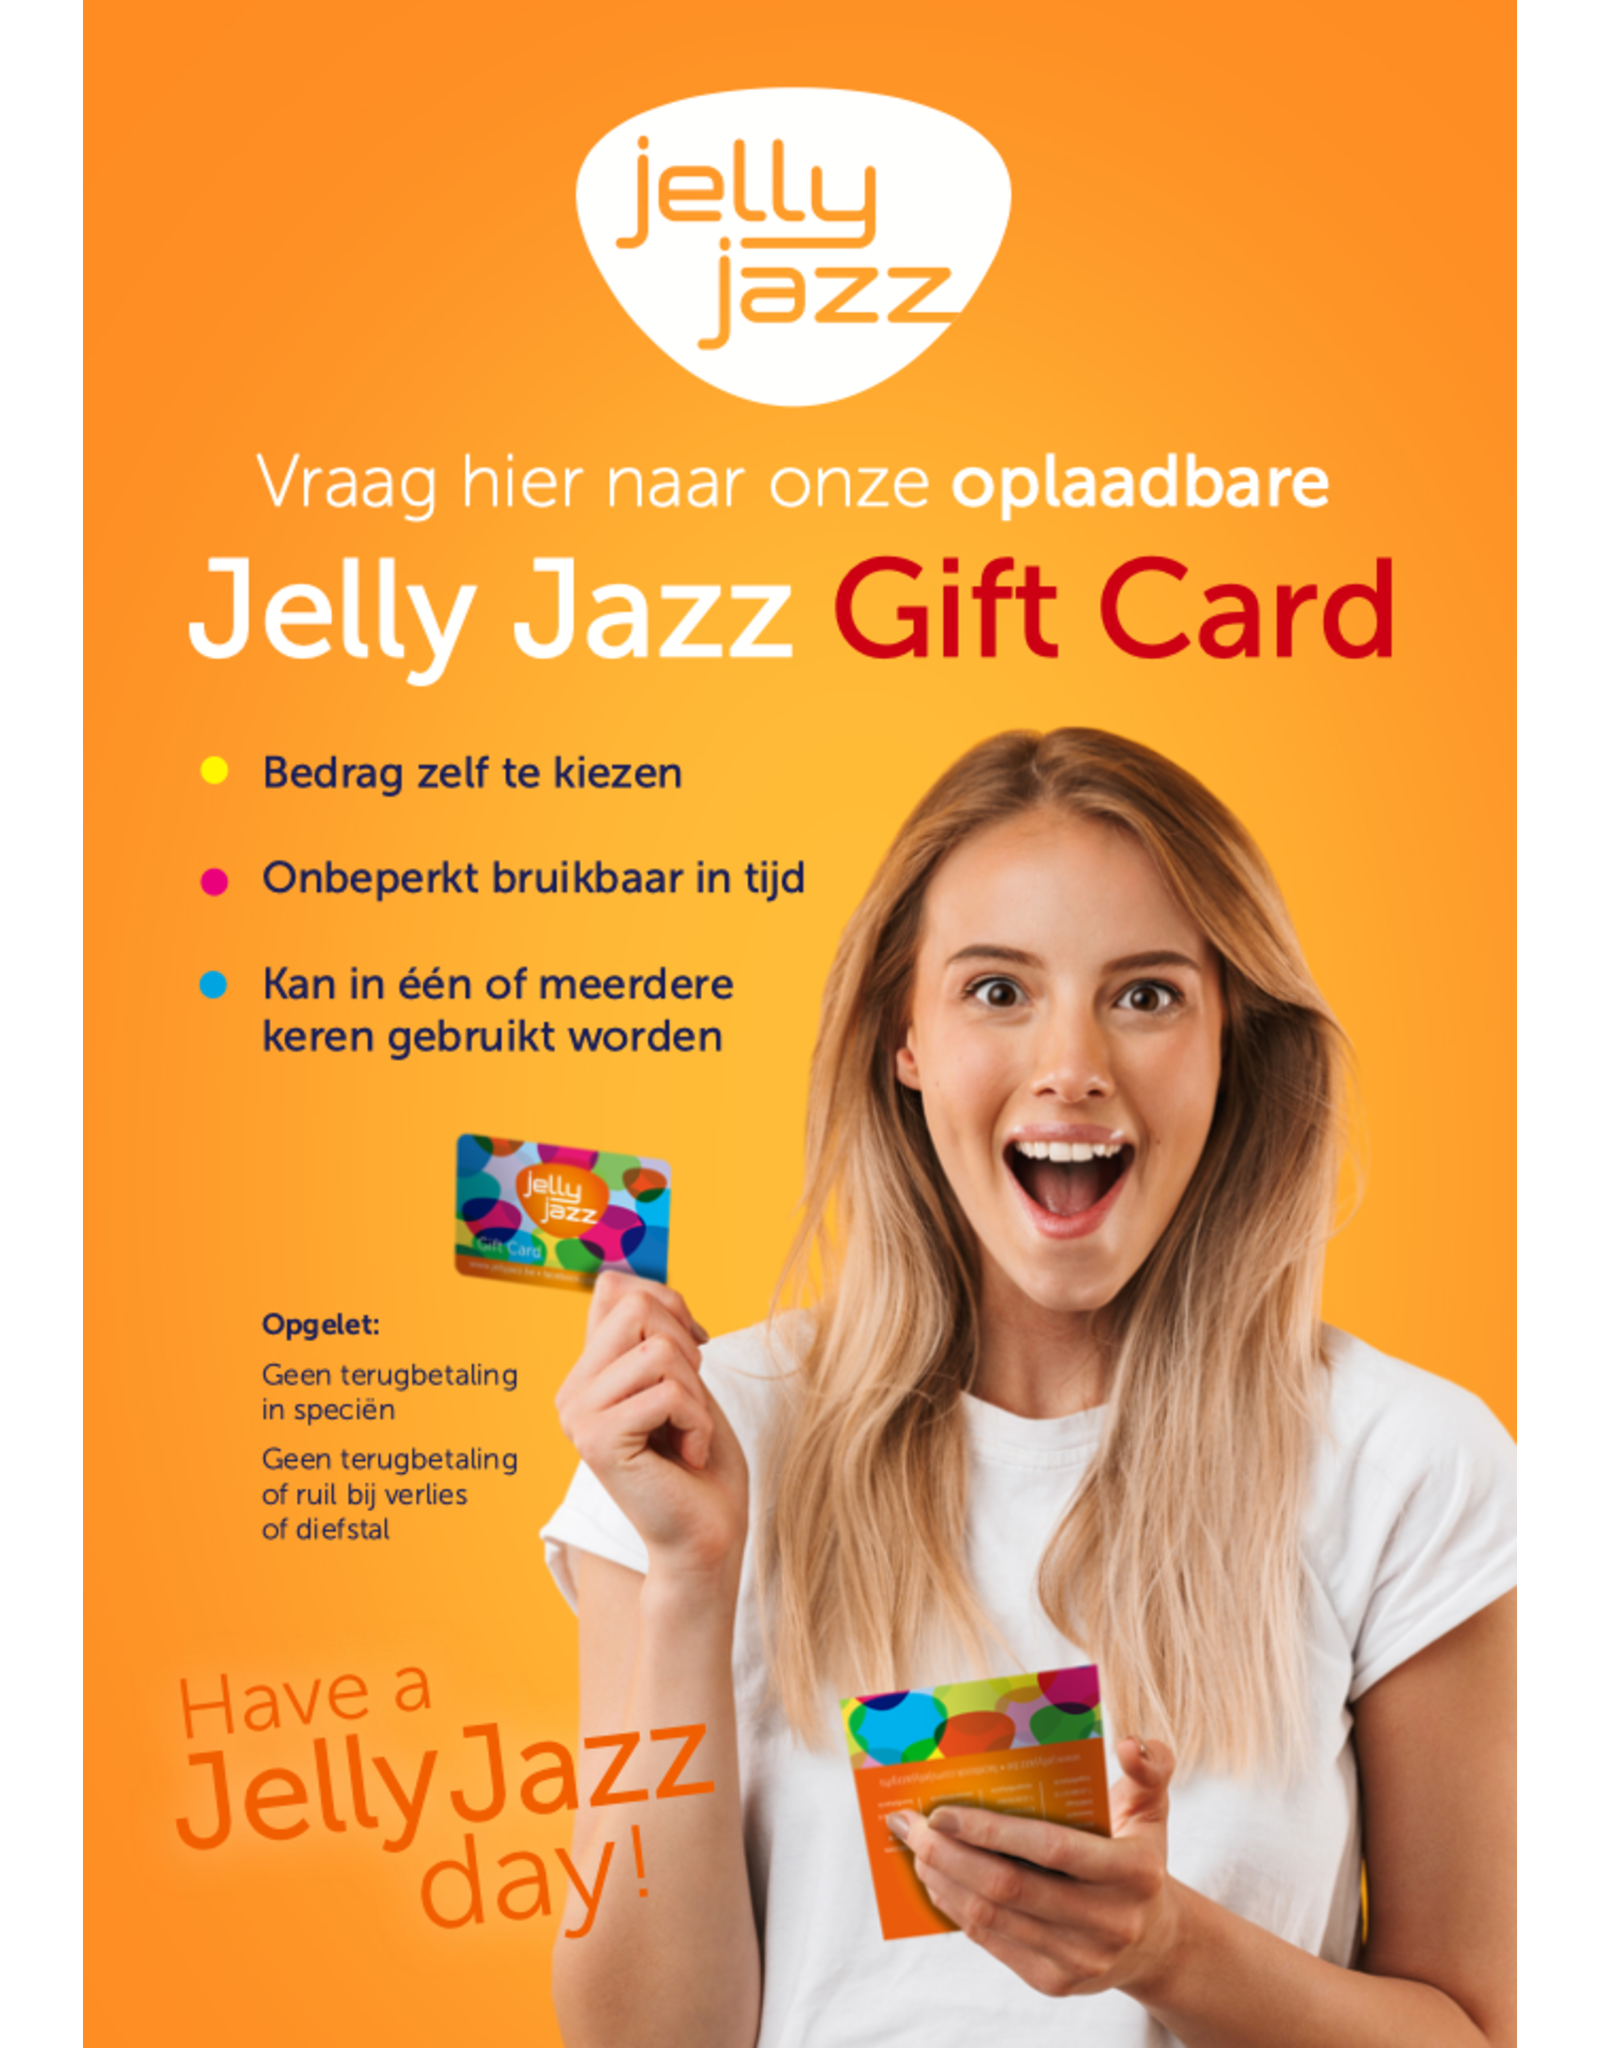 Jelly Jazz gift card €10